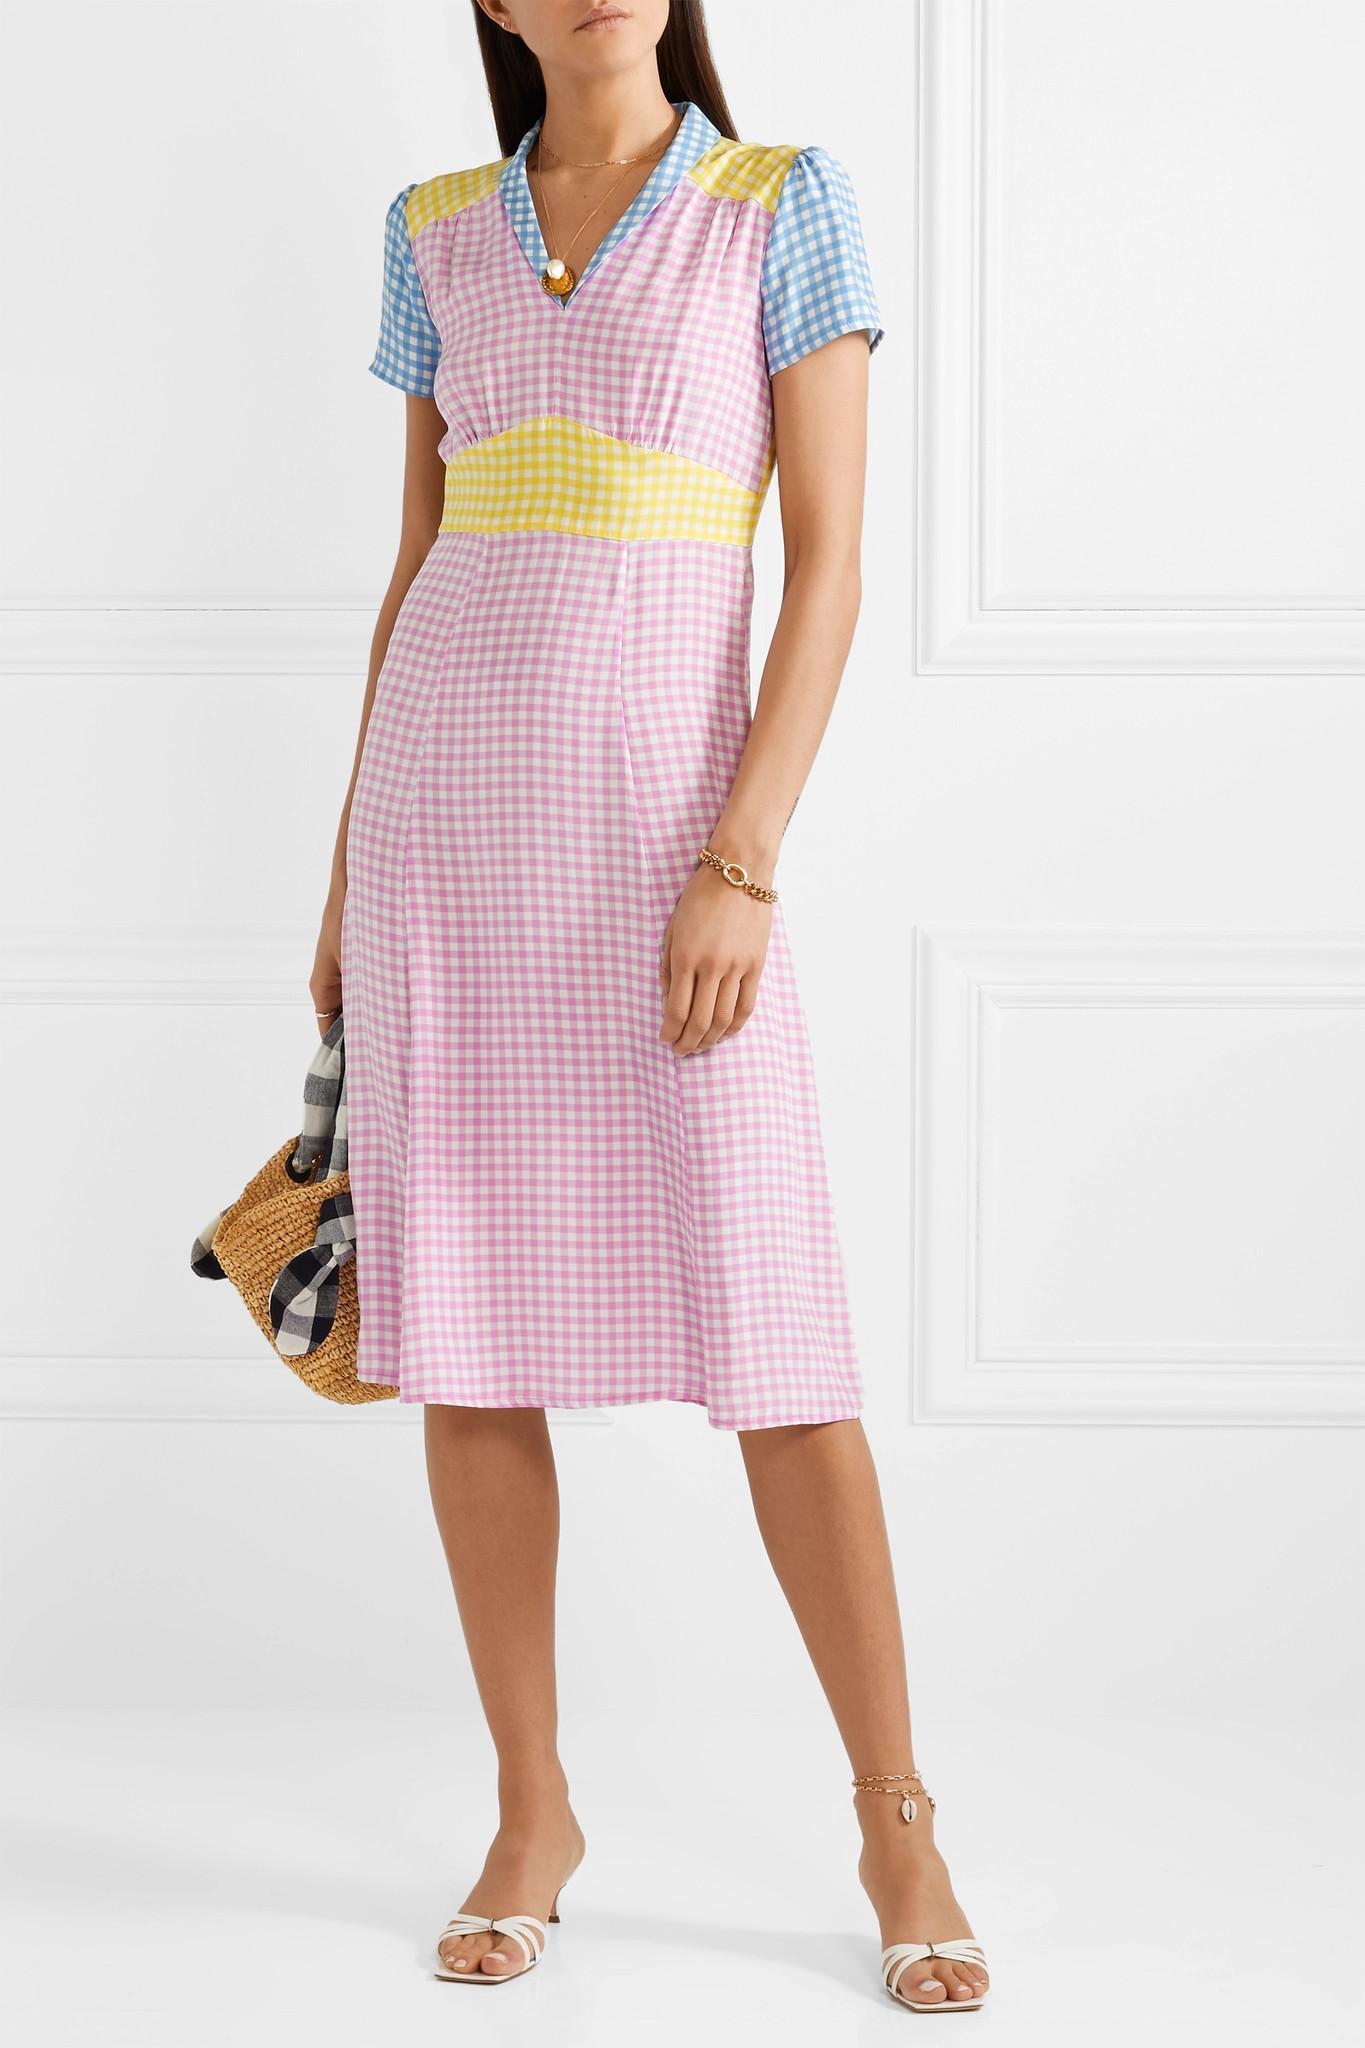 Lyst - HVN Morgan Gingham Silk Crepe De Chine Dress in Pink 3c45720cf